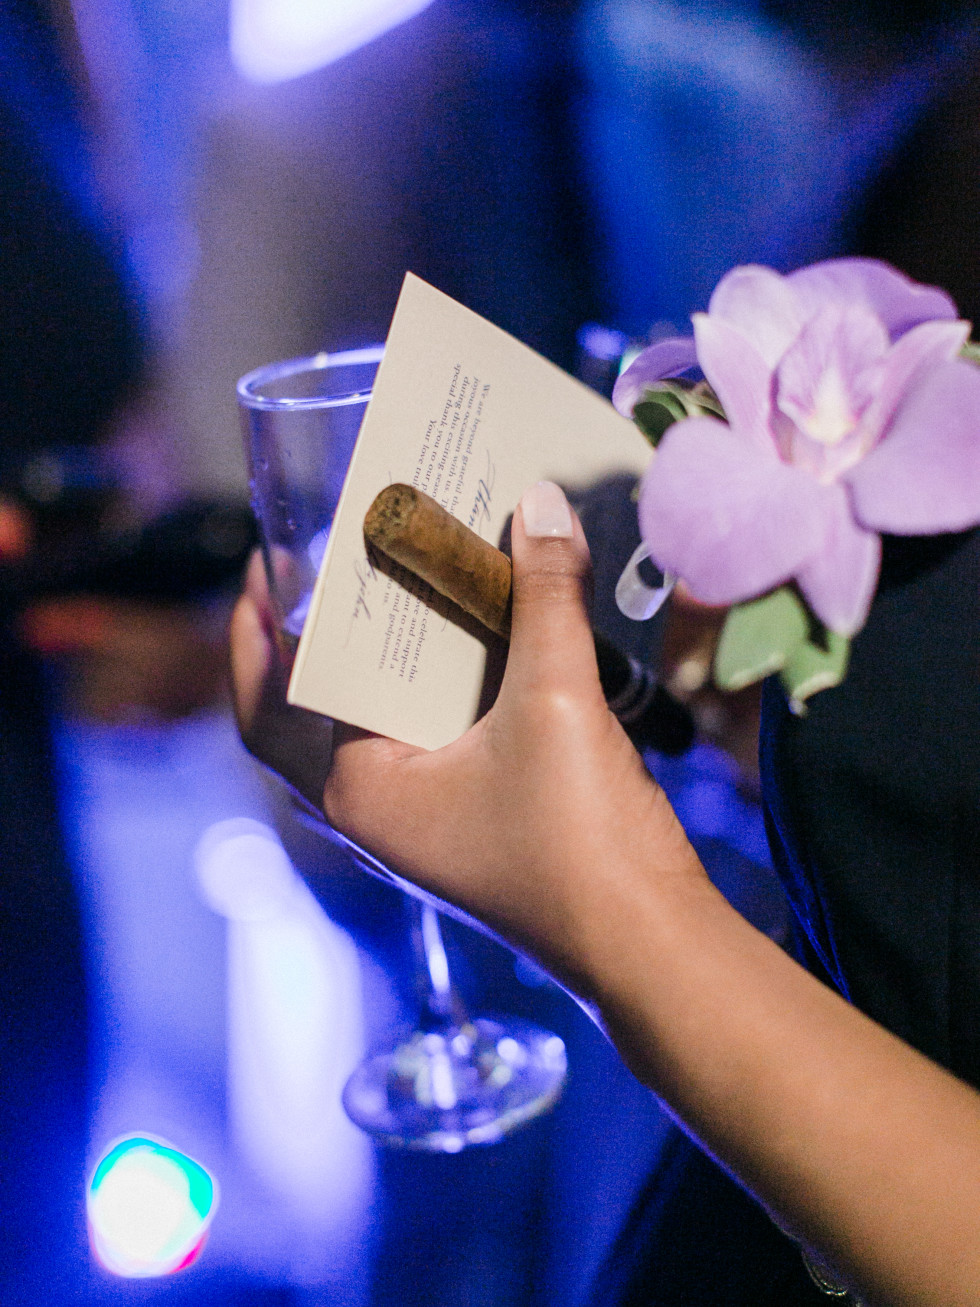 Wonderful Weddings, Kendhal Gardner, Feb. 2016, cocktails & cigars